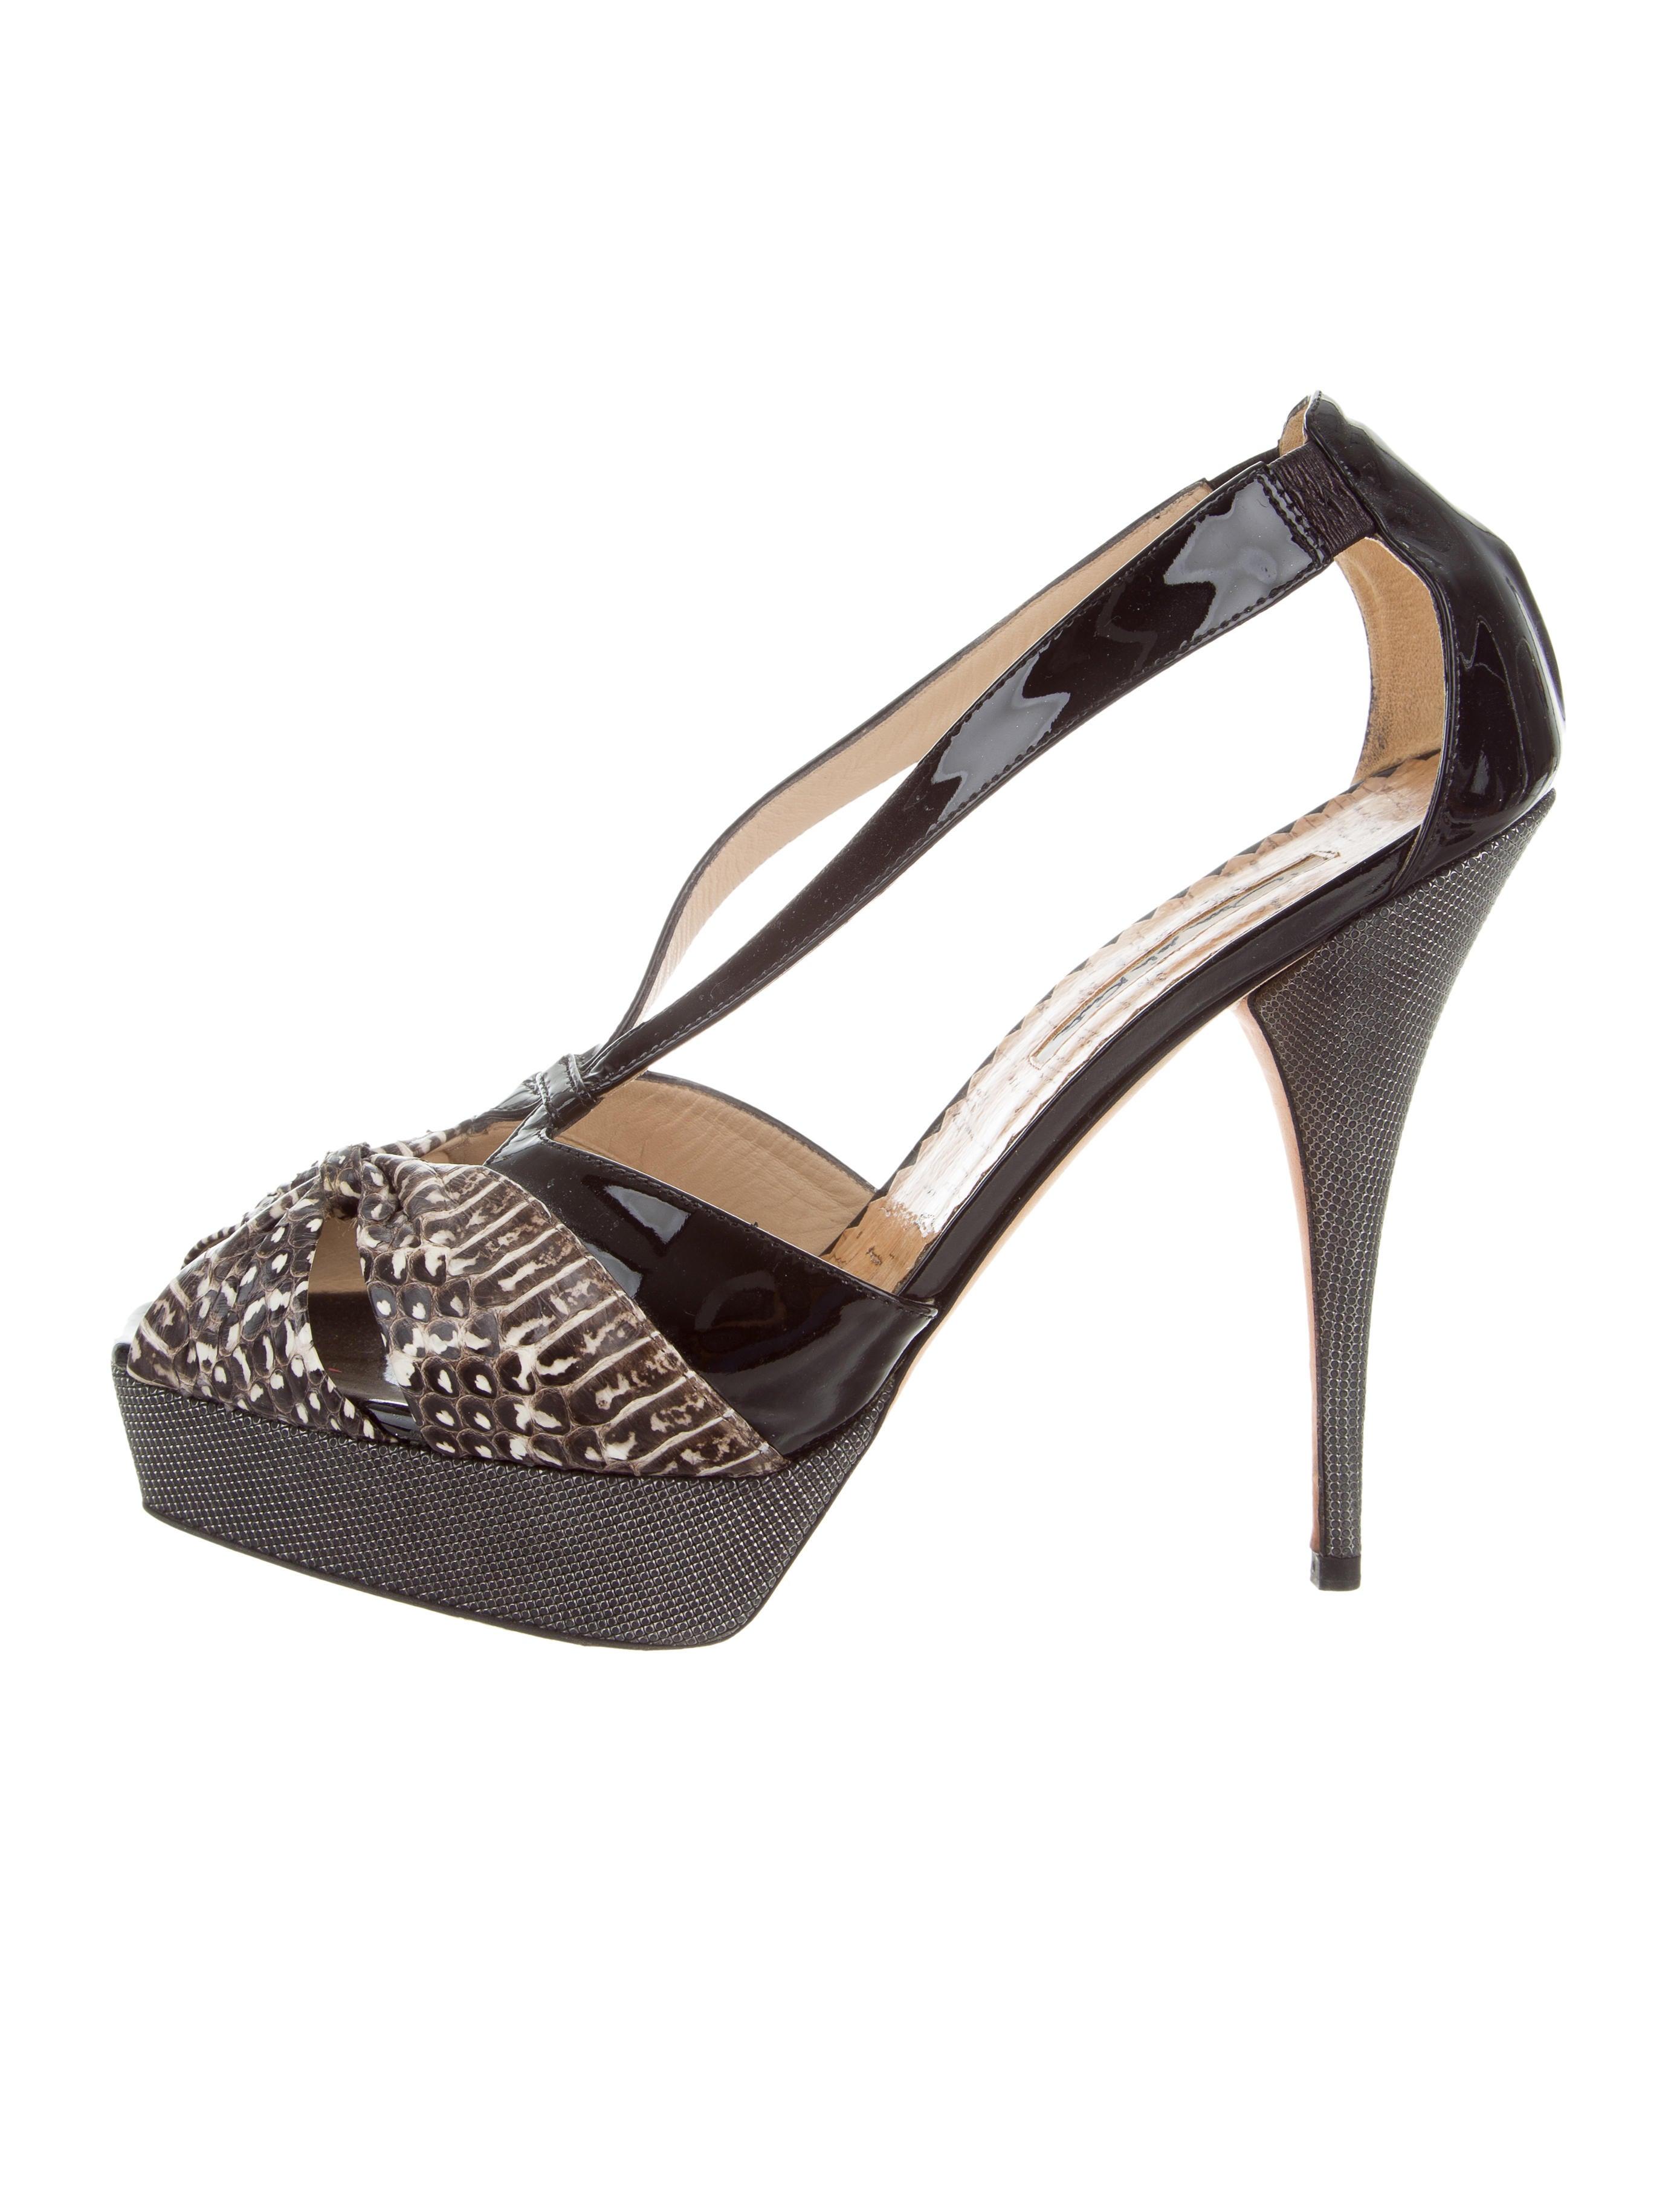 clearance extremely discounts cheap price Oscar de la Renta Snakeskin Platform Sandals discount amazon OJ6GHTrm